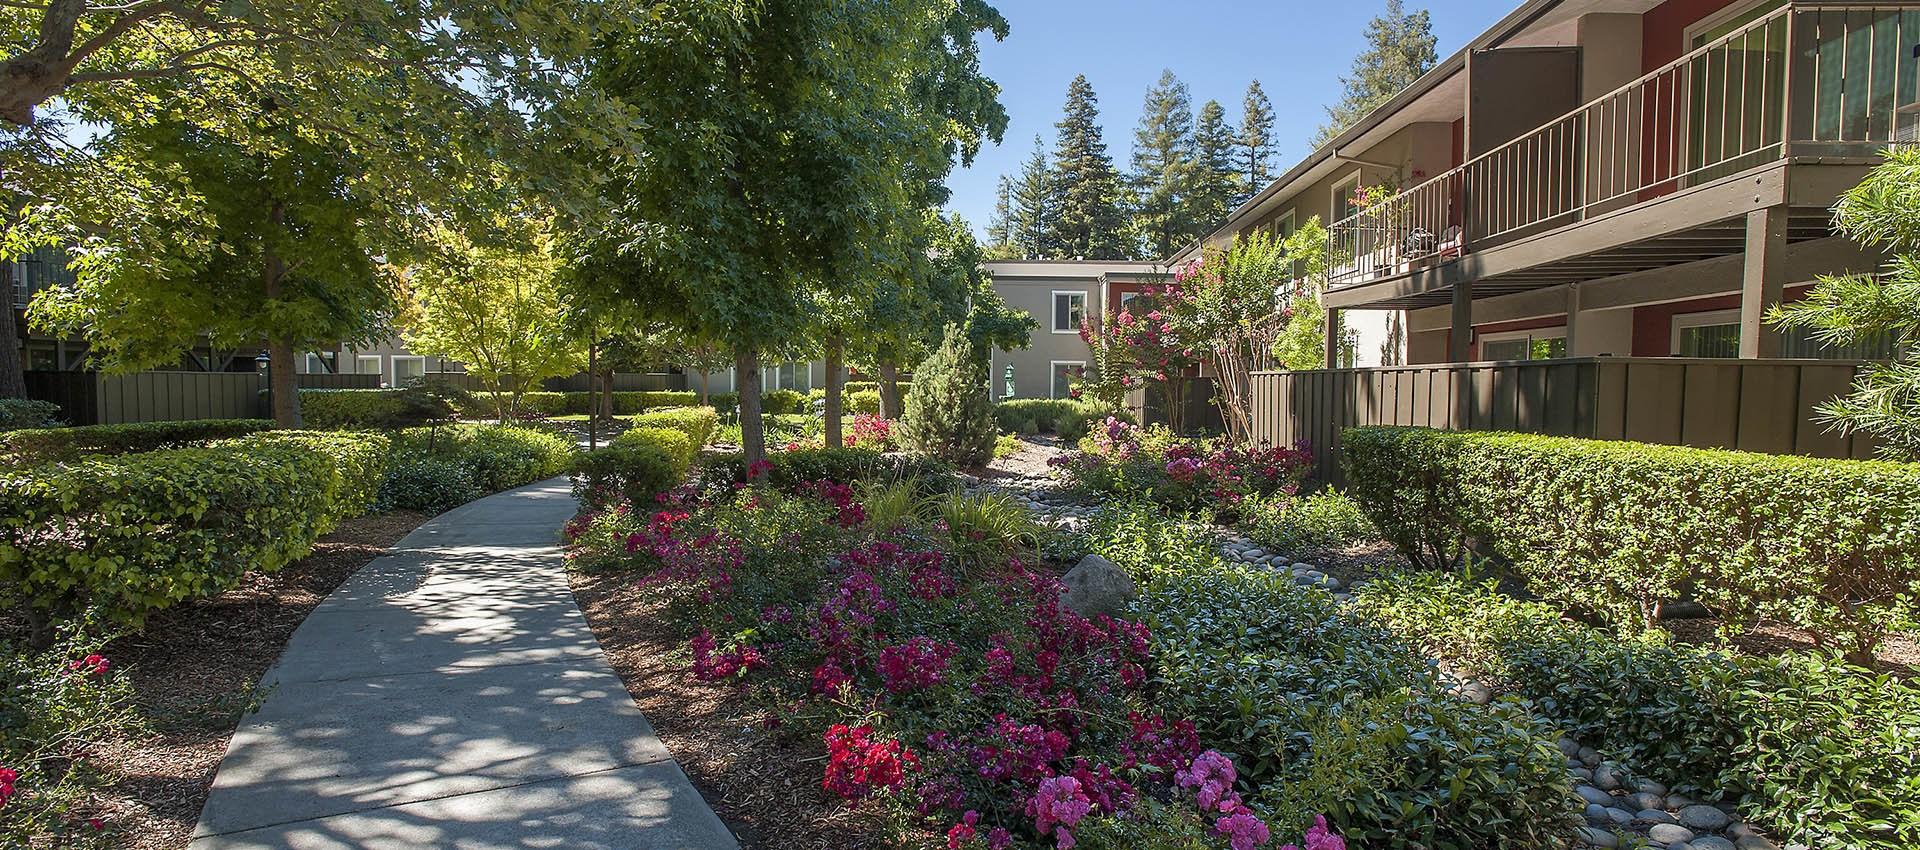 Lovely Courtyards at Flora Condominium Rentals in Walnut Creek